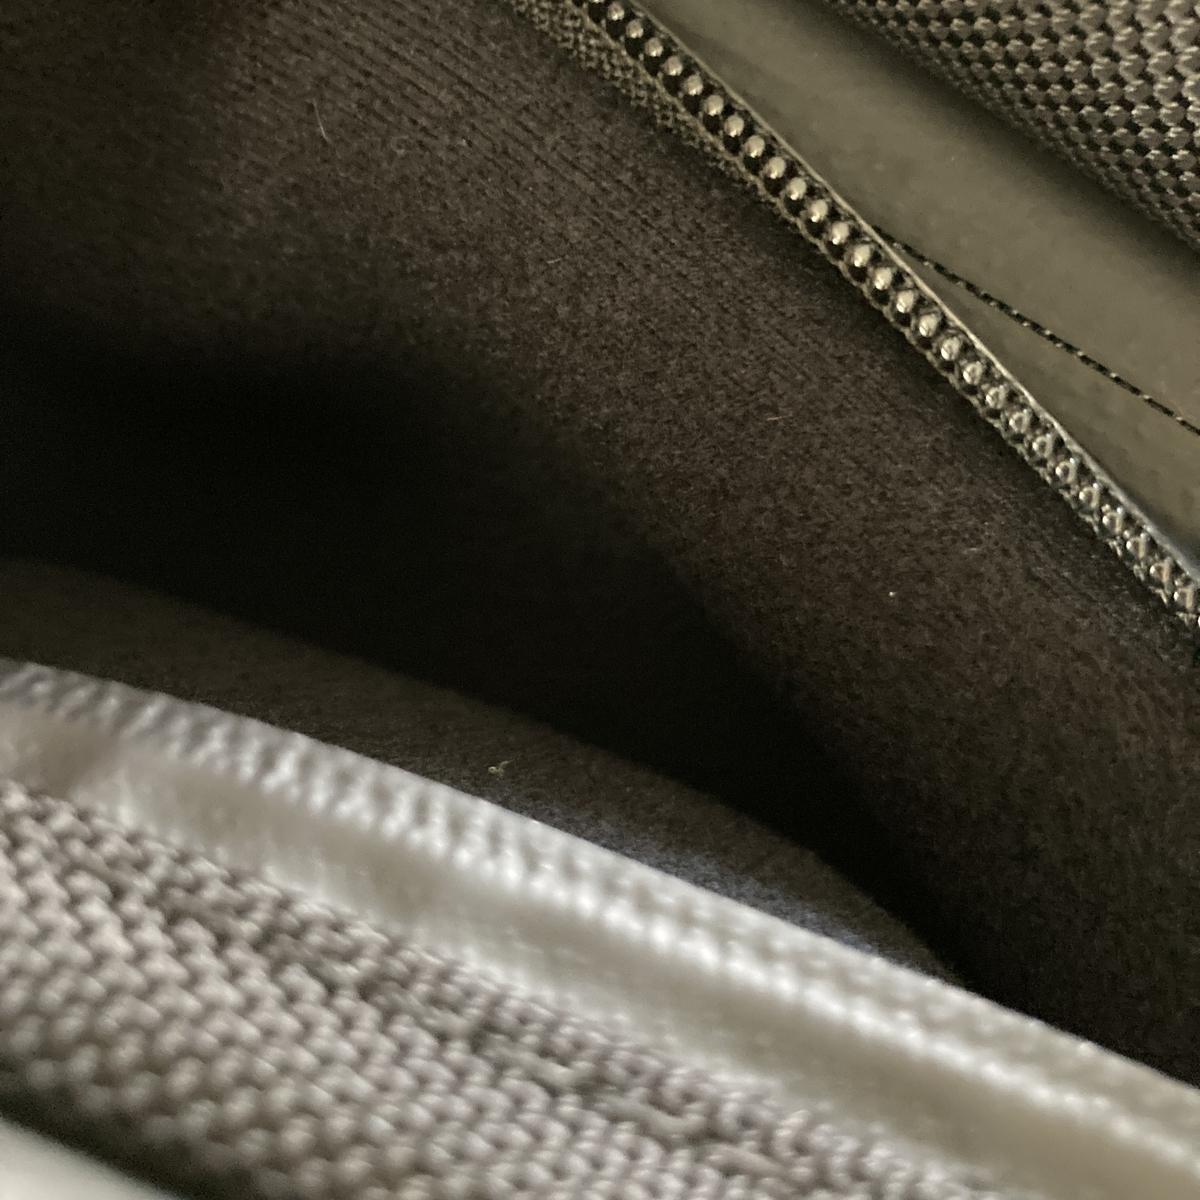 Aer エアー Tech Pack 2 BLACK TechPack2 AER-31010 fitpack daypack slimpack 防水 防水リュック  YKK®AquaGuard コーデュラバリスティックナイロン DURAFLEX Duraflex 通気性 ビジネスマン ビジネス 社会人 ジム コンパートメント 止水ジップ 完全防水 止水 デザイン